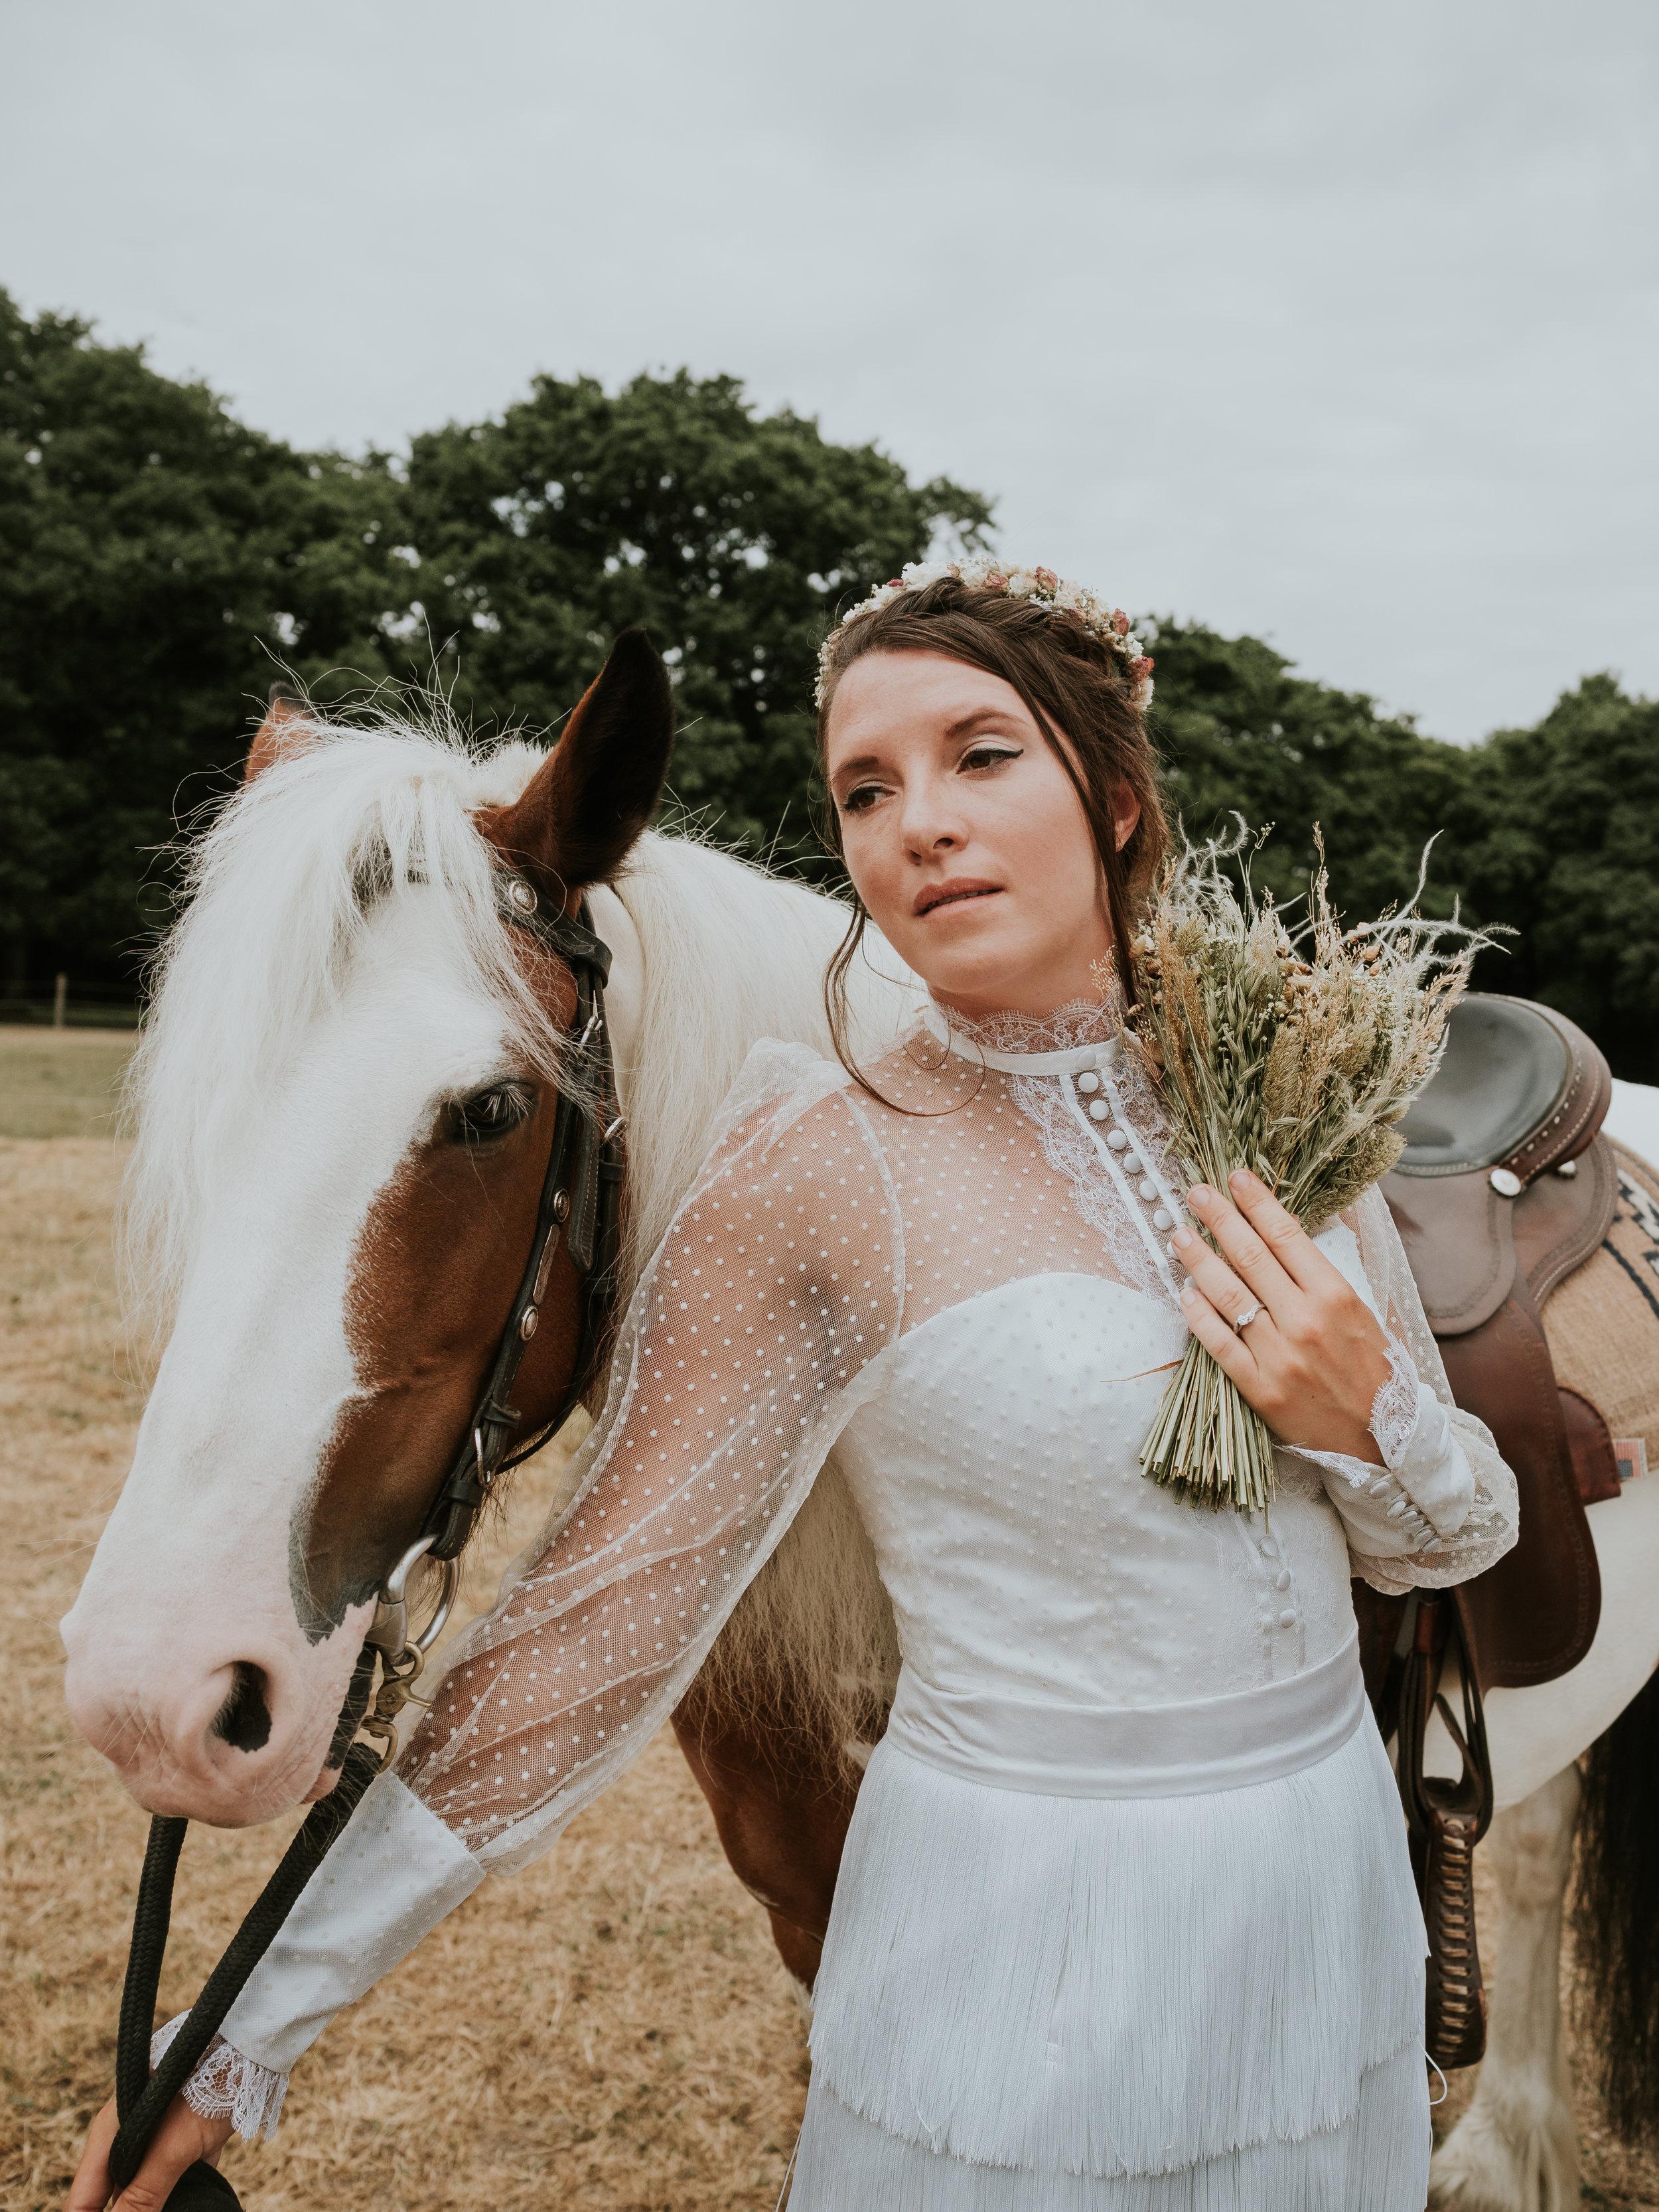 Jessica-Milberg-Photography-Brighton-London-Wedding-Fashion-Photographer-Creative-Wedding-Dress-25.jpg